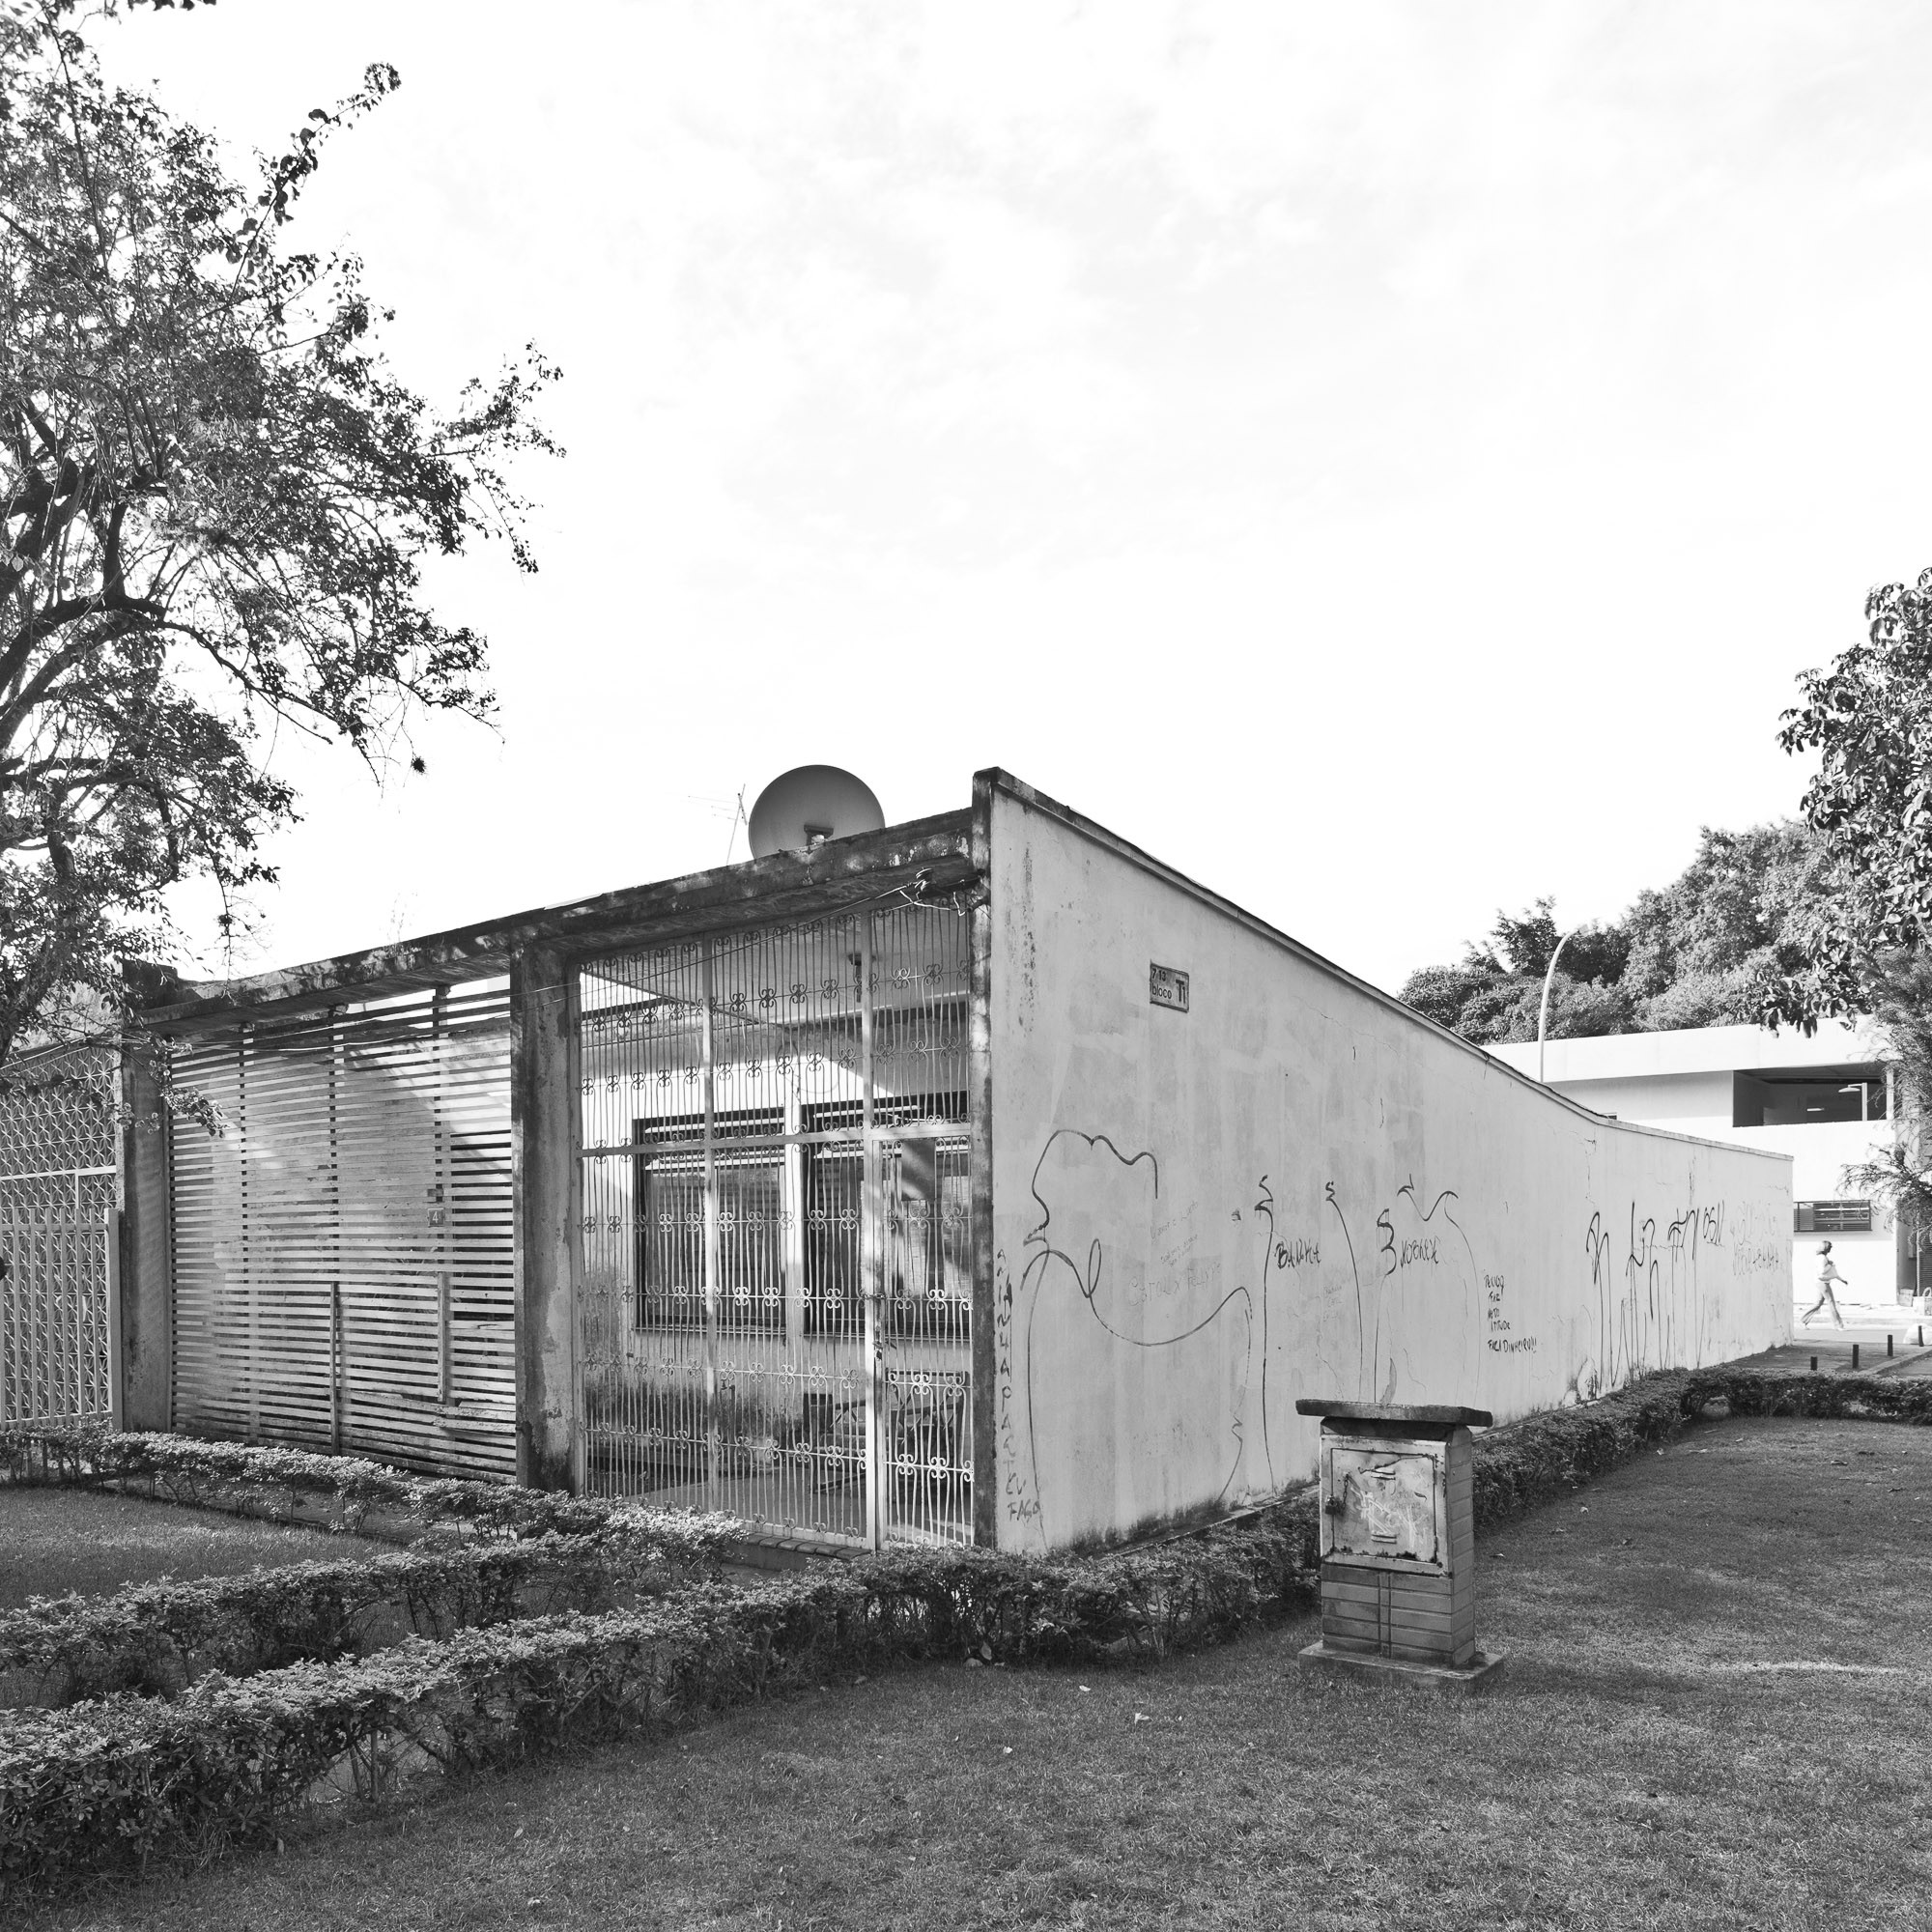 Casas Geminadas en Brasília Casa dos Arcos © Joana França